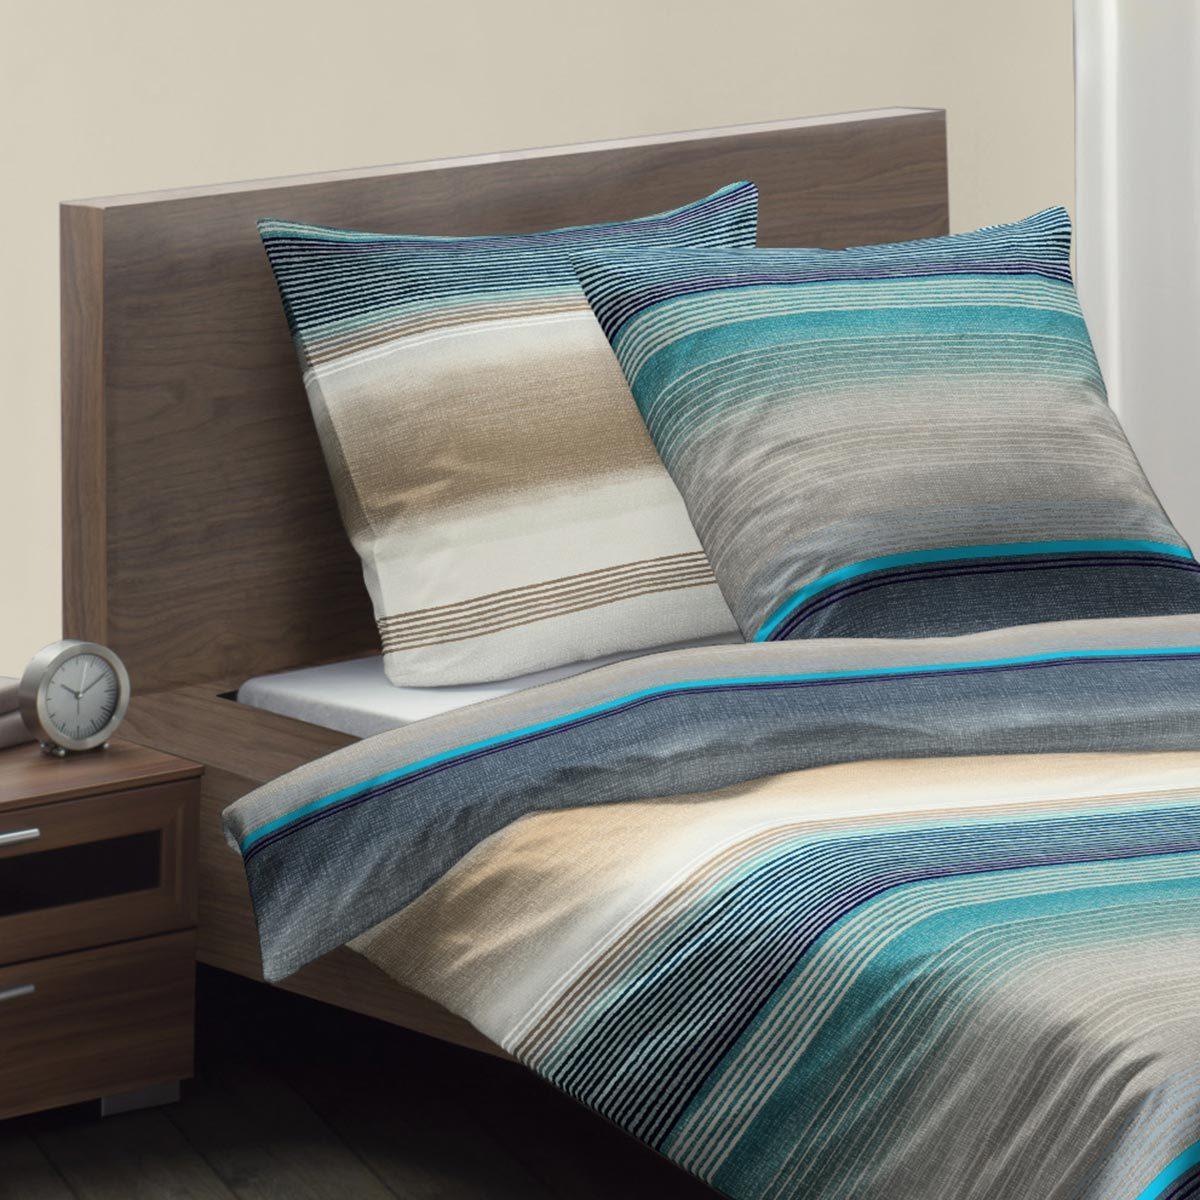 fleuresse mako satin bettw sche modern life 113511 0002 g nstig online kaufen bei bettwaren shop. Black Bedroom Furniture Sets. Home Design Ideas